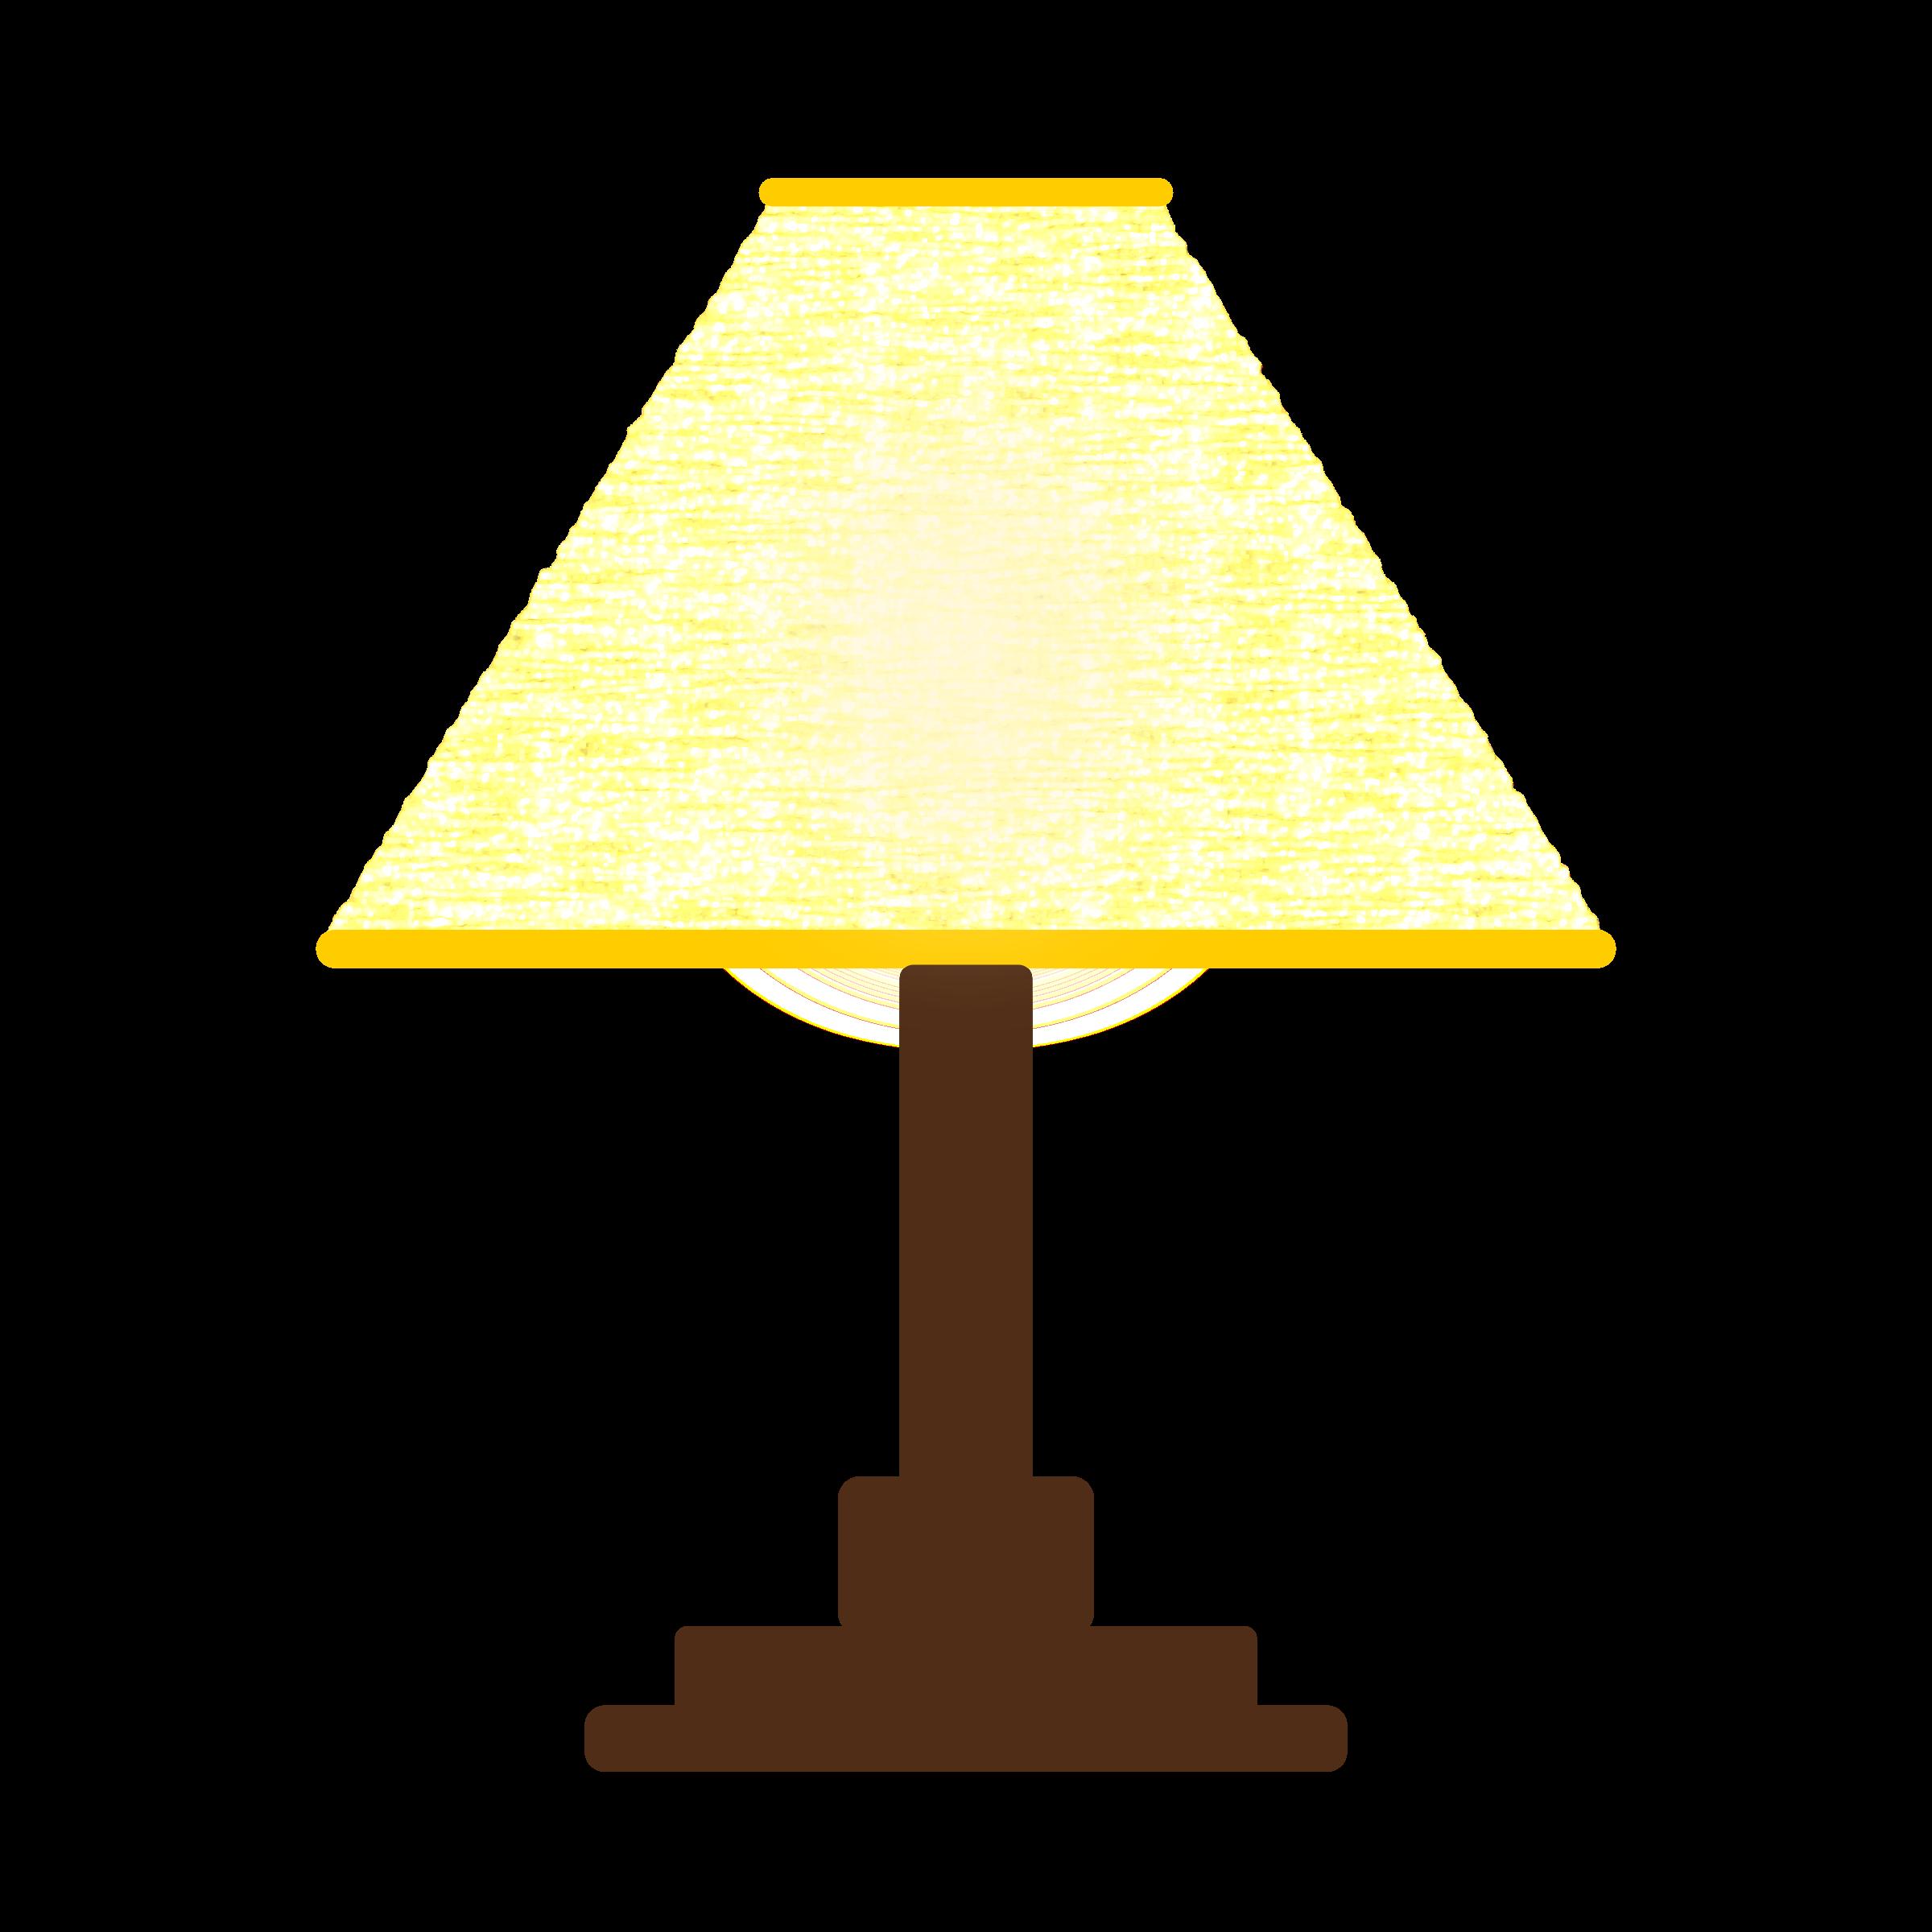 Yellow shade simple three. Lamp clipart light